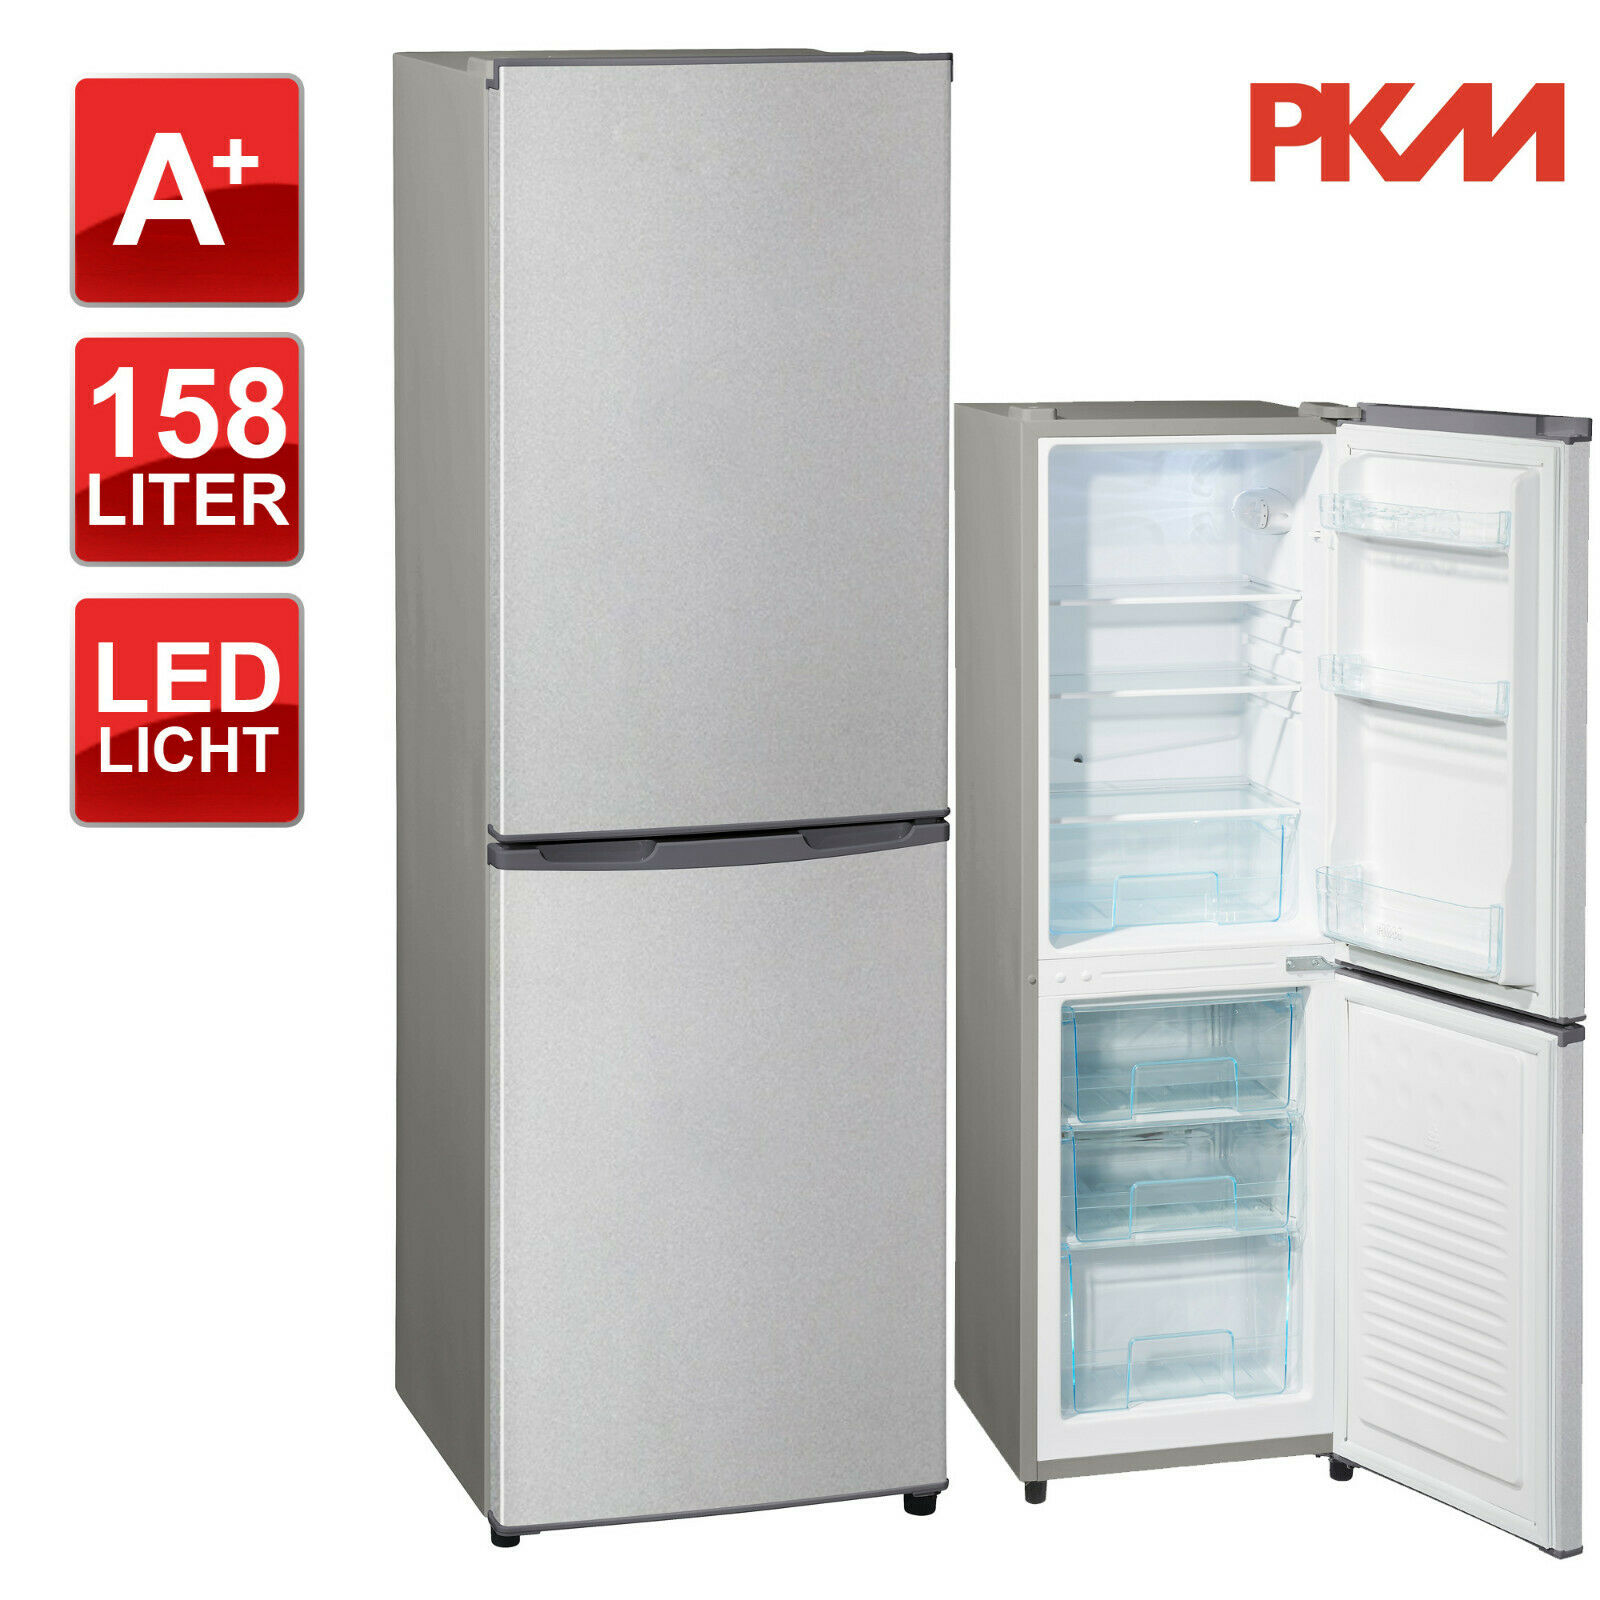 Kühlschrank Kühl-Gefrierkombination A+ PKM KG162.4A+ silber 158 Liter